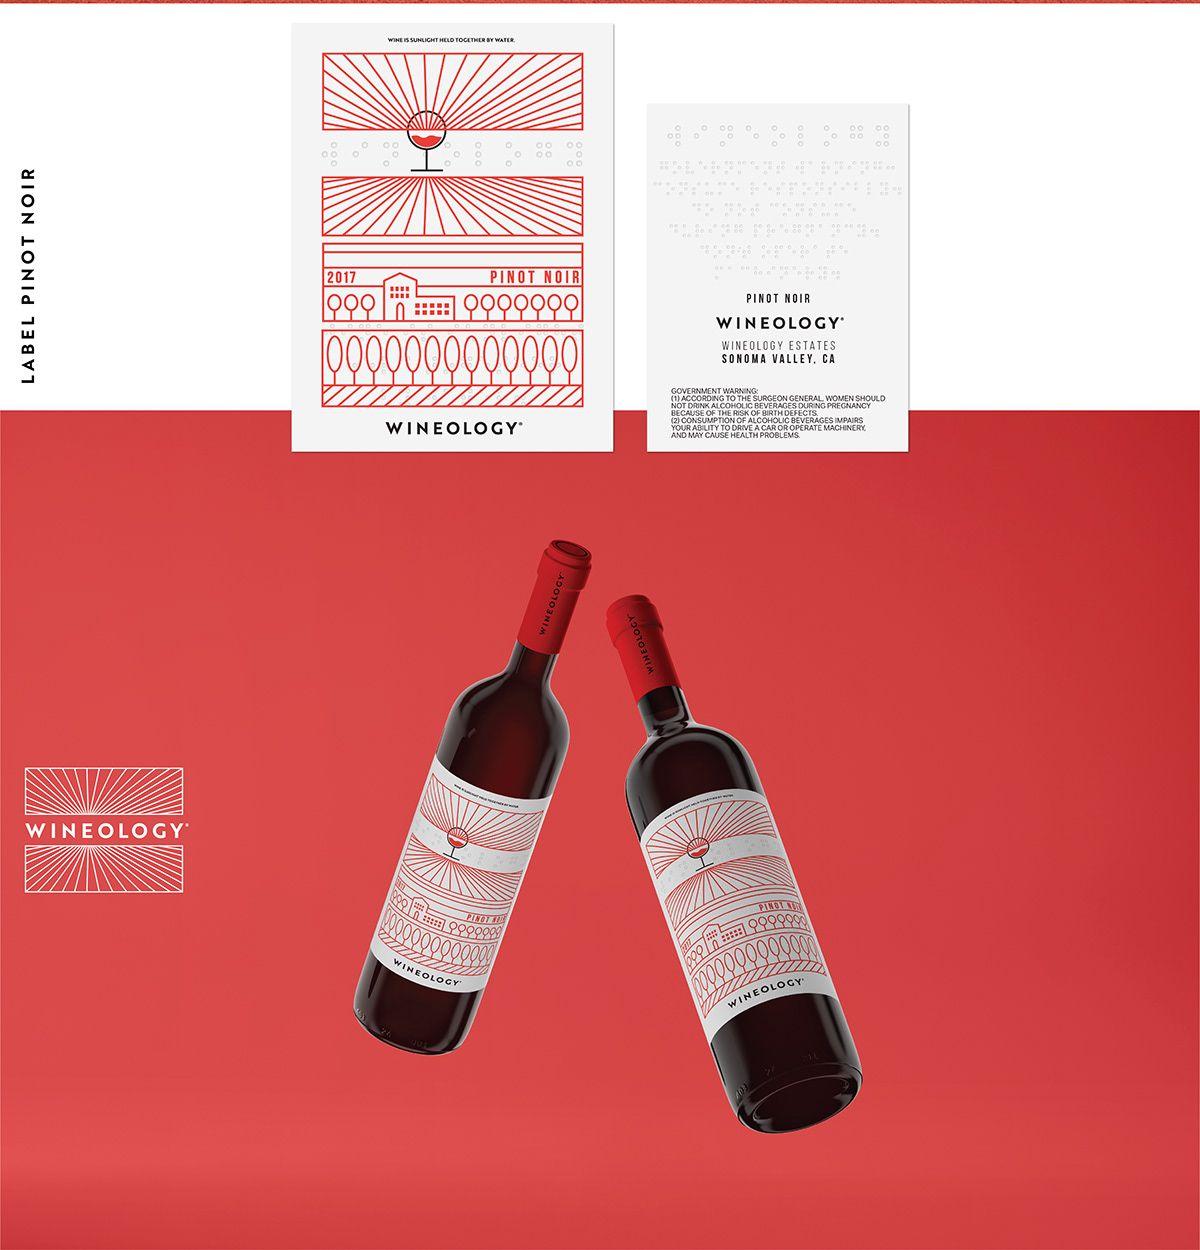 Wineology On Behance Book Editorial Design Freelance Graphic Design Behance